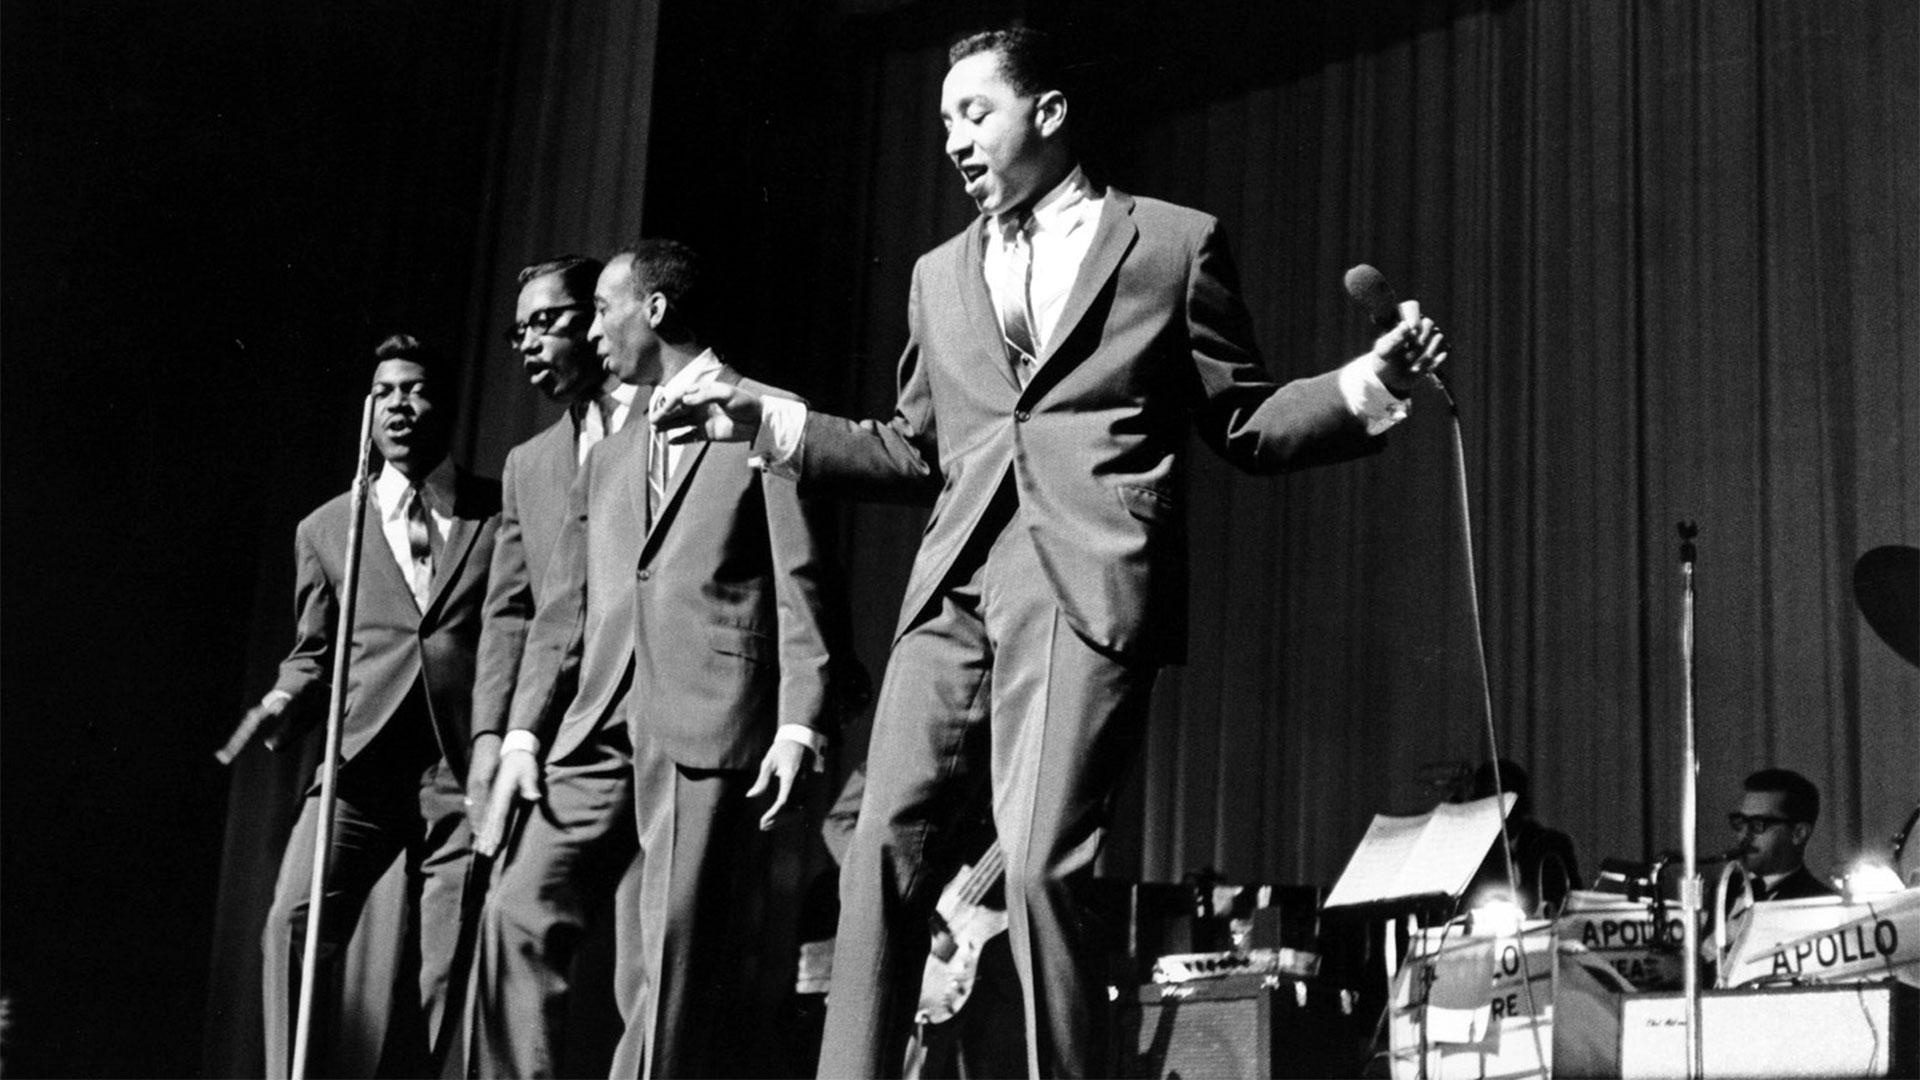 Motown 25 (My Music Presents)